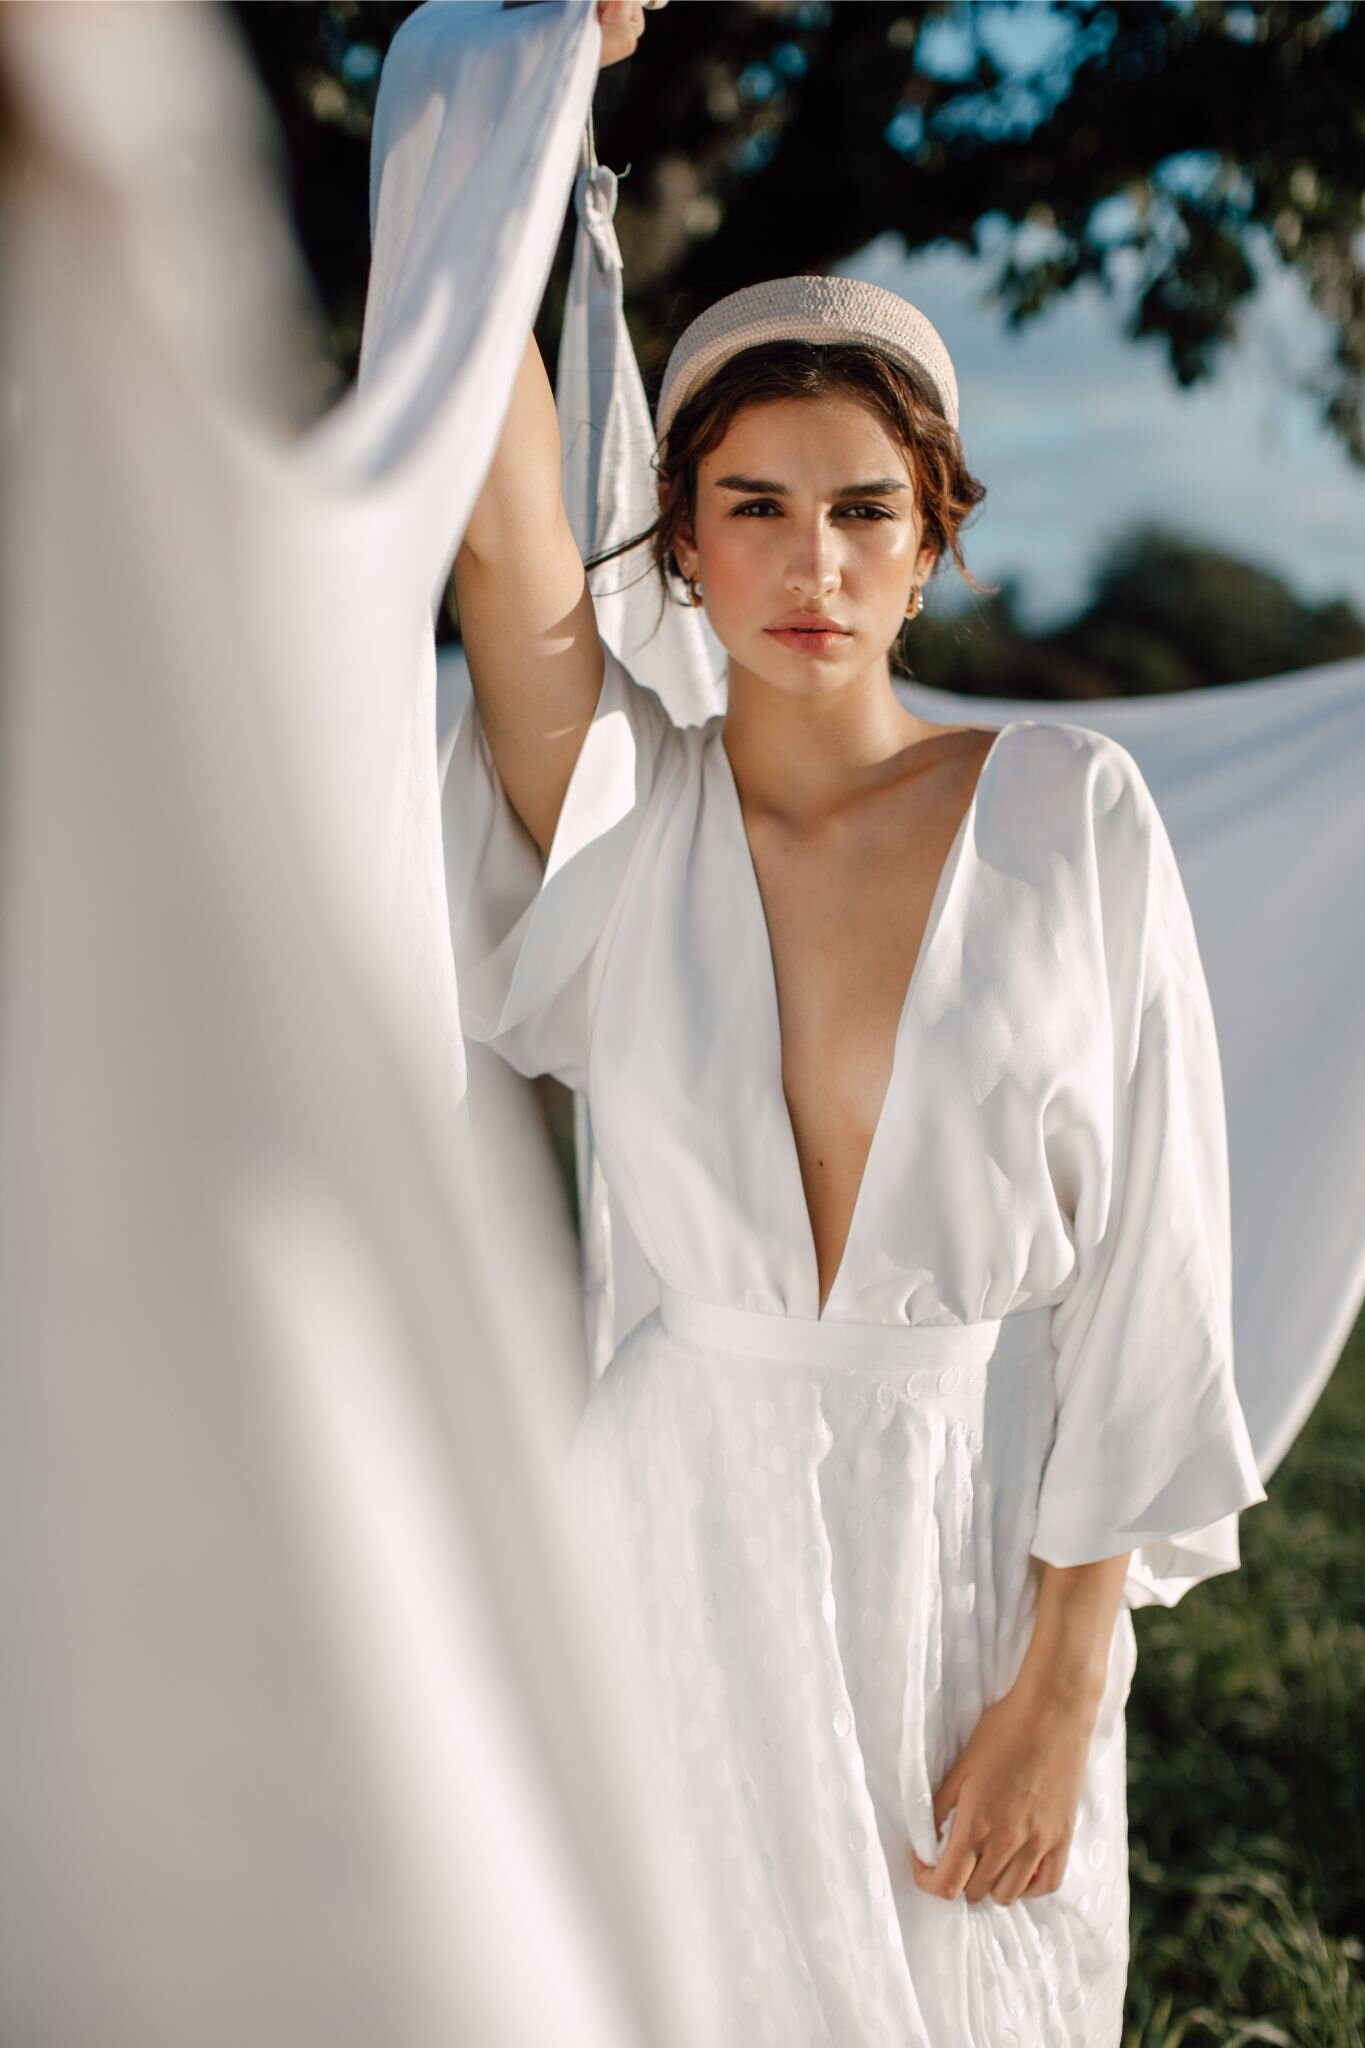 the-saums-charlie-brear-summer-bride-fashion-editorial-19.jpg